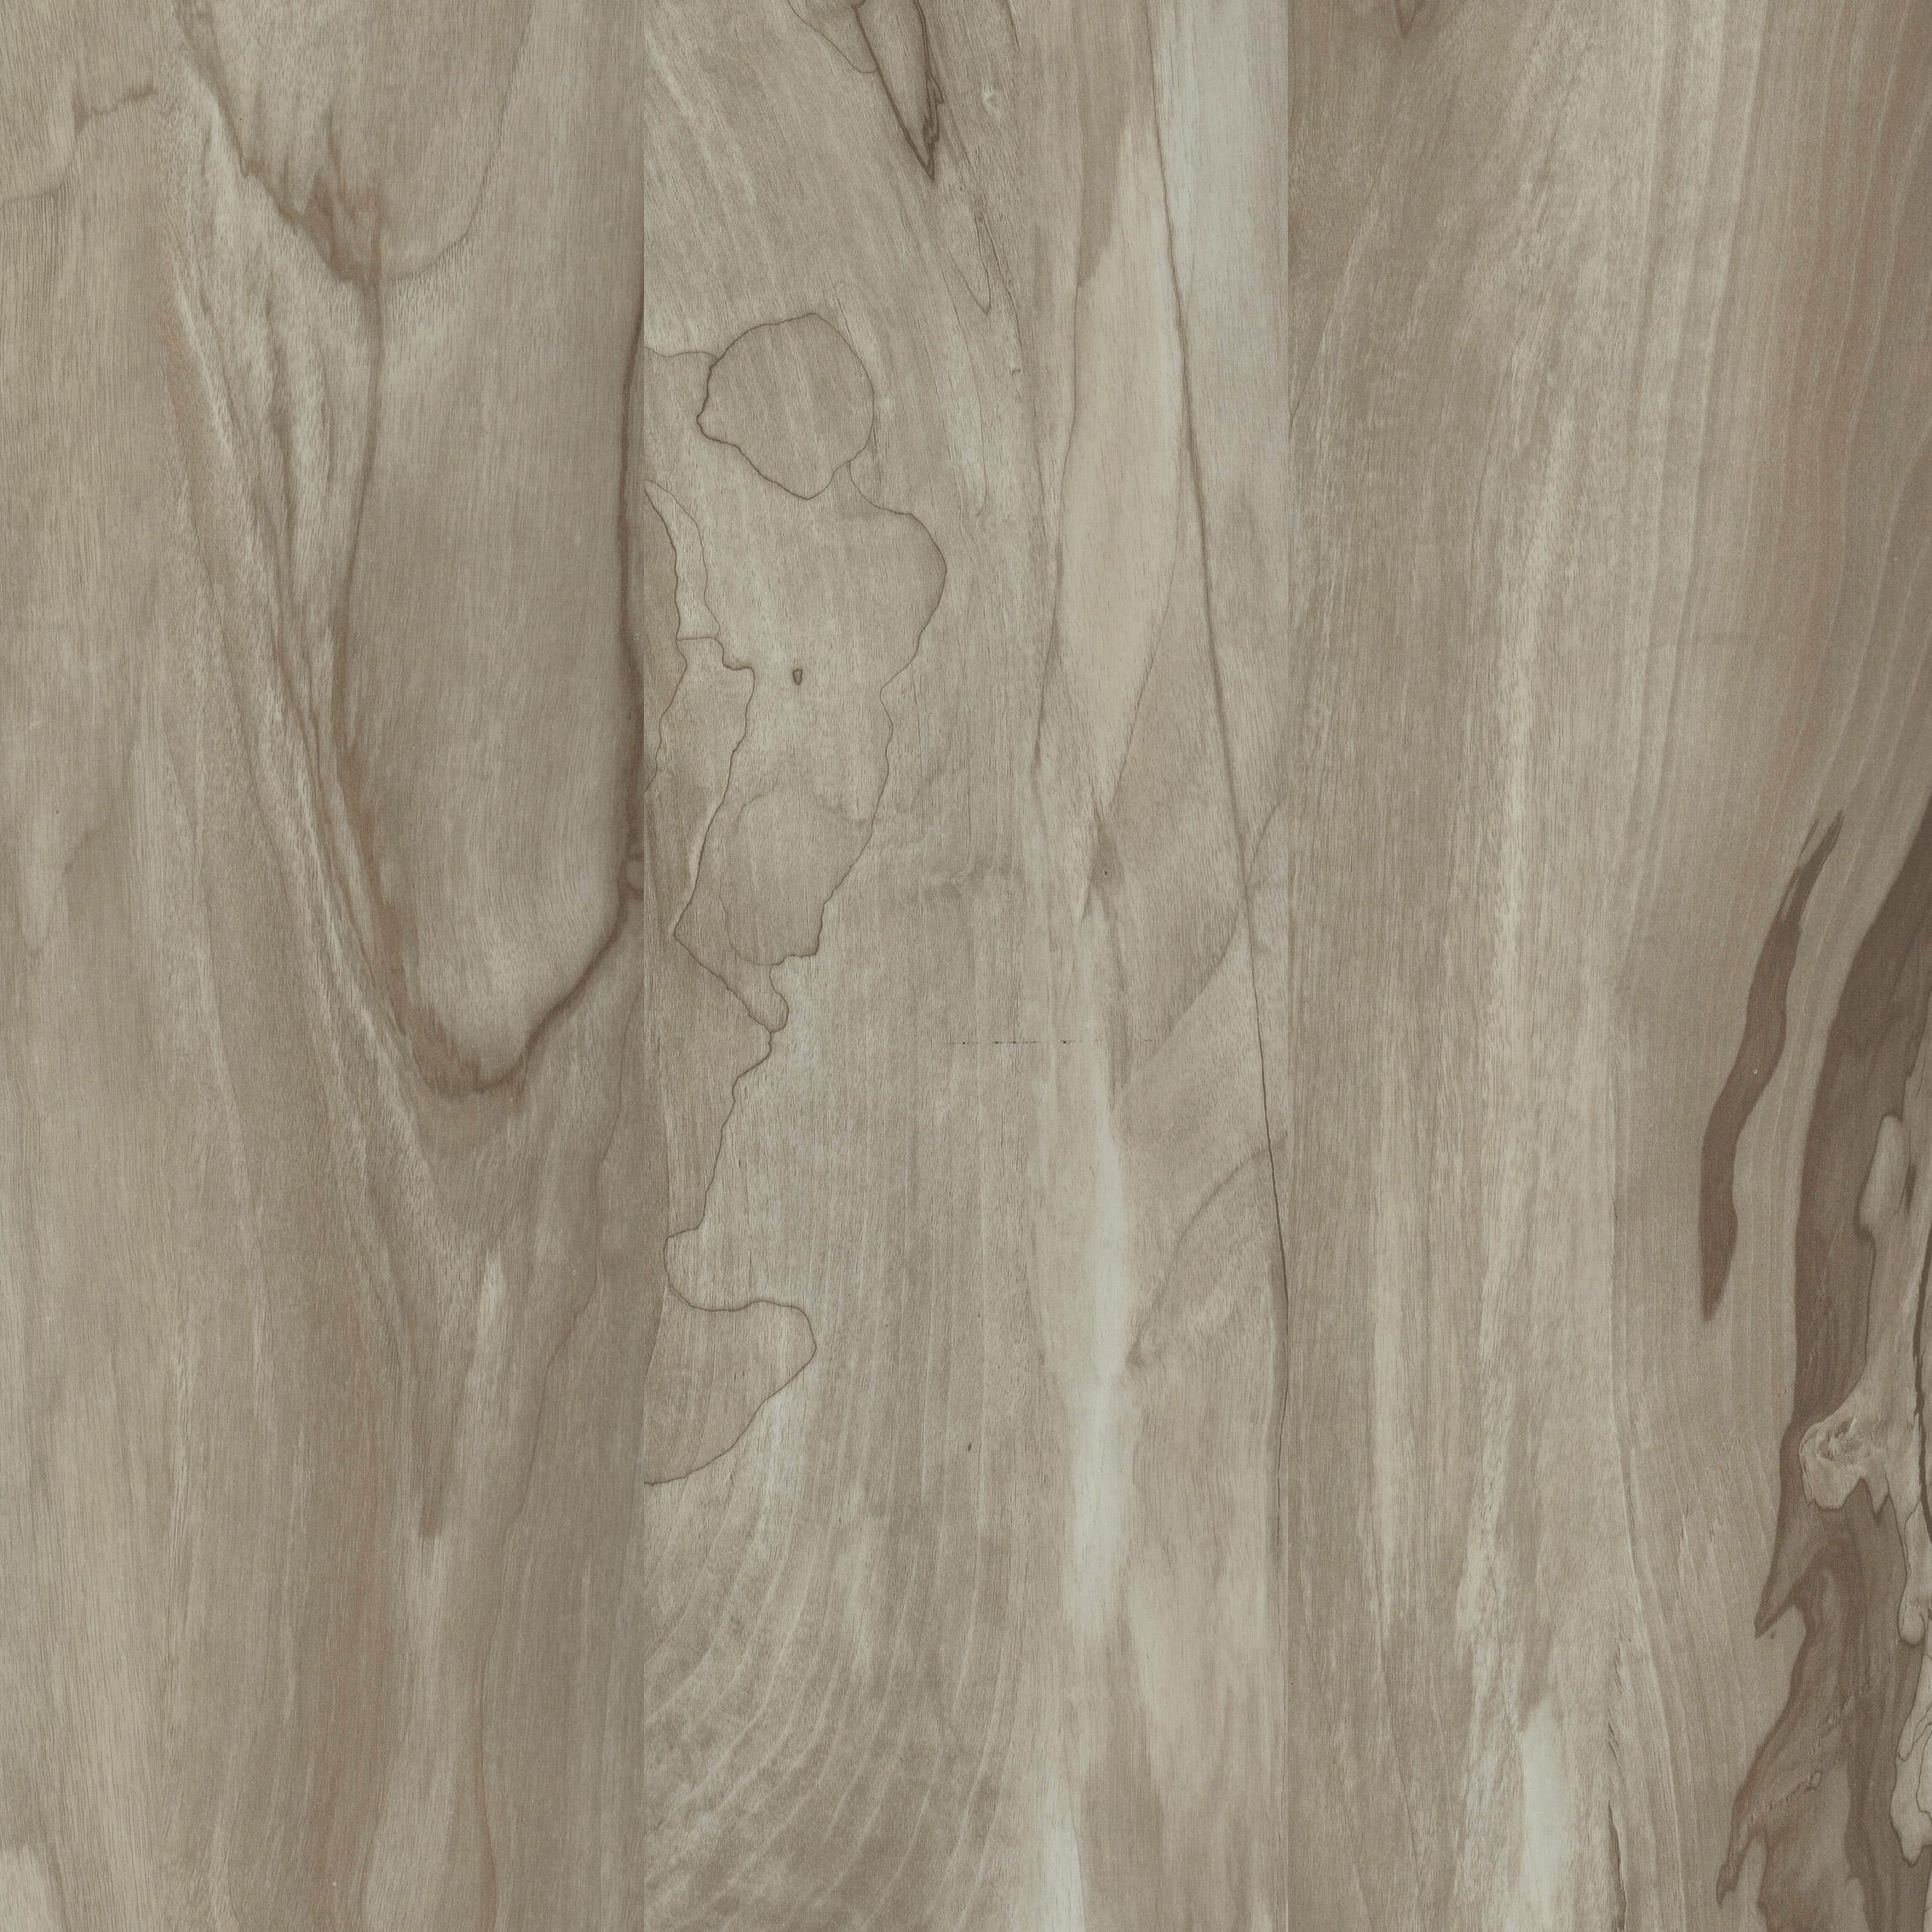 wide plank grey hardwood flooring of moduleo vision brookwood 7 56 luxury vinyl plank flooring 60087 inside more views